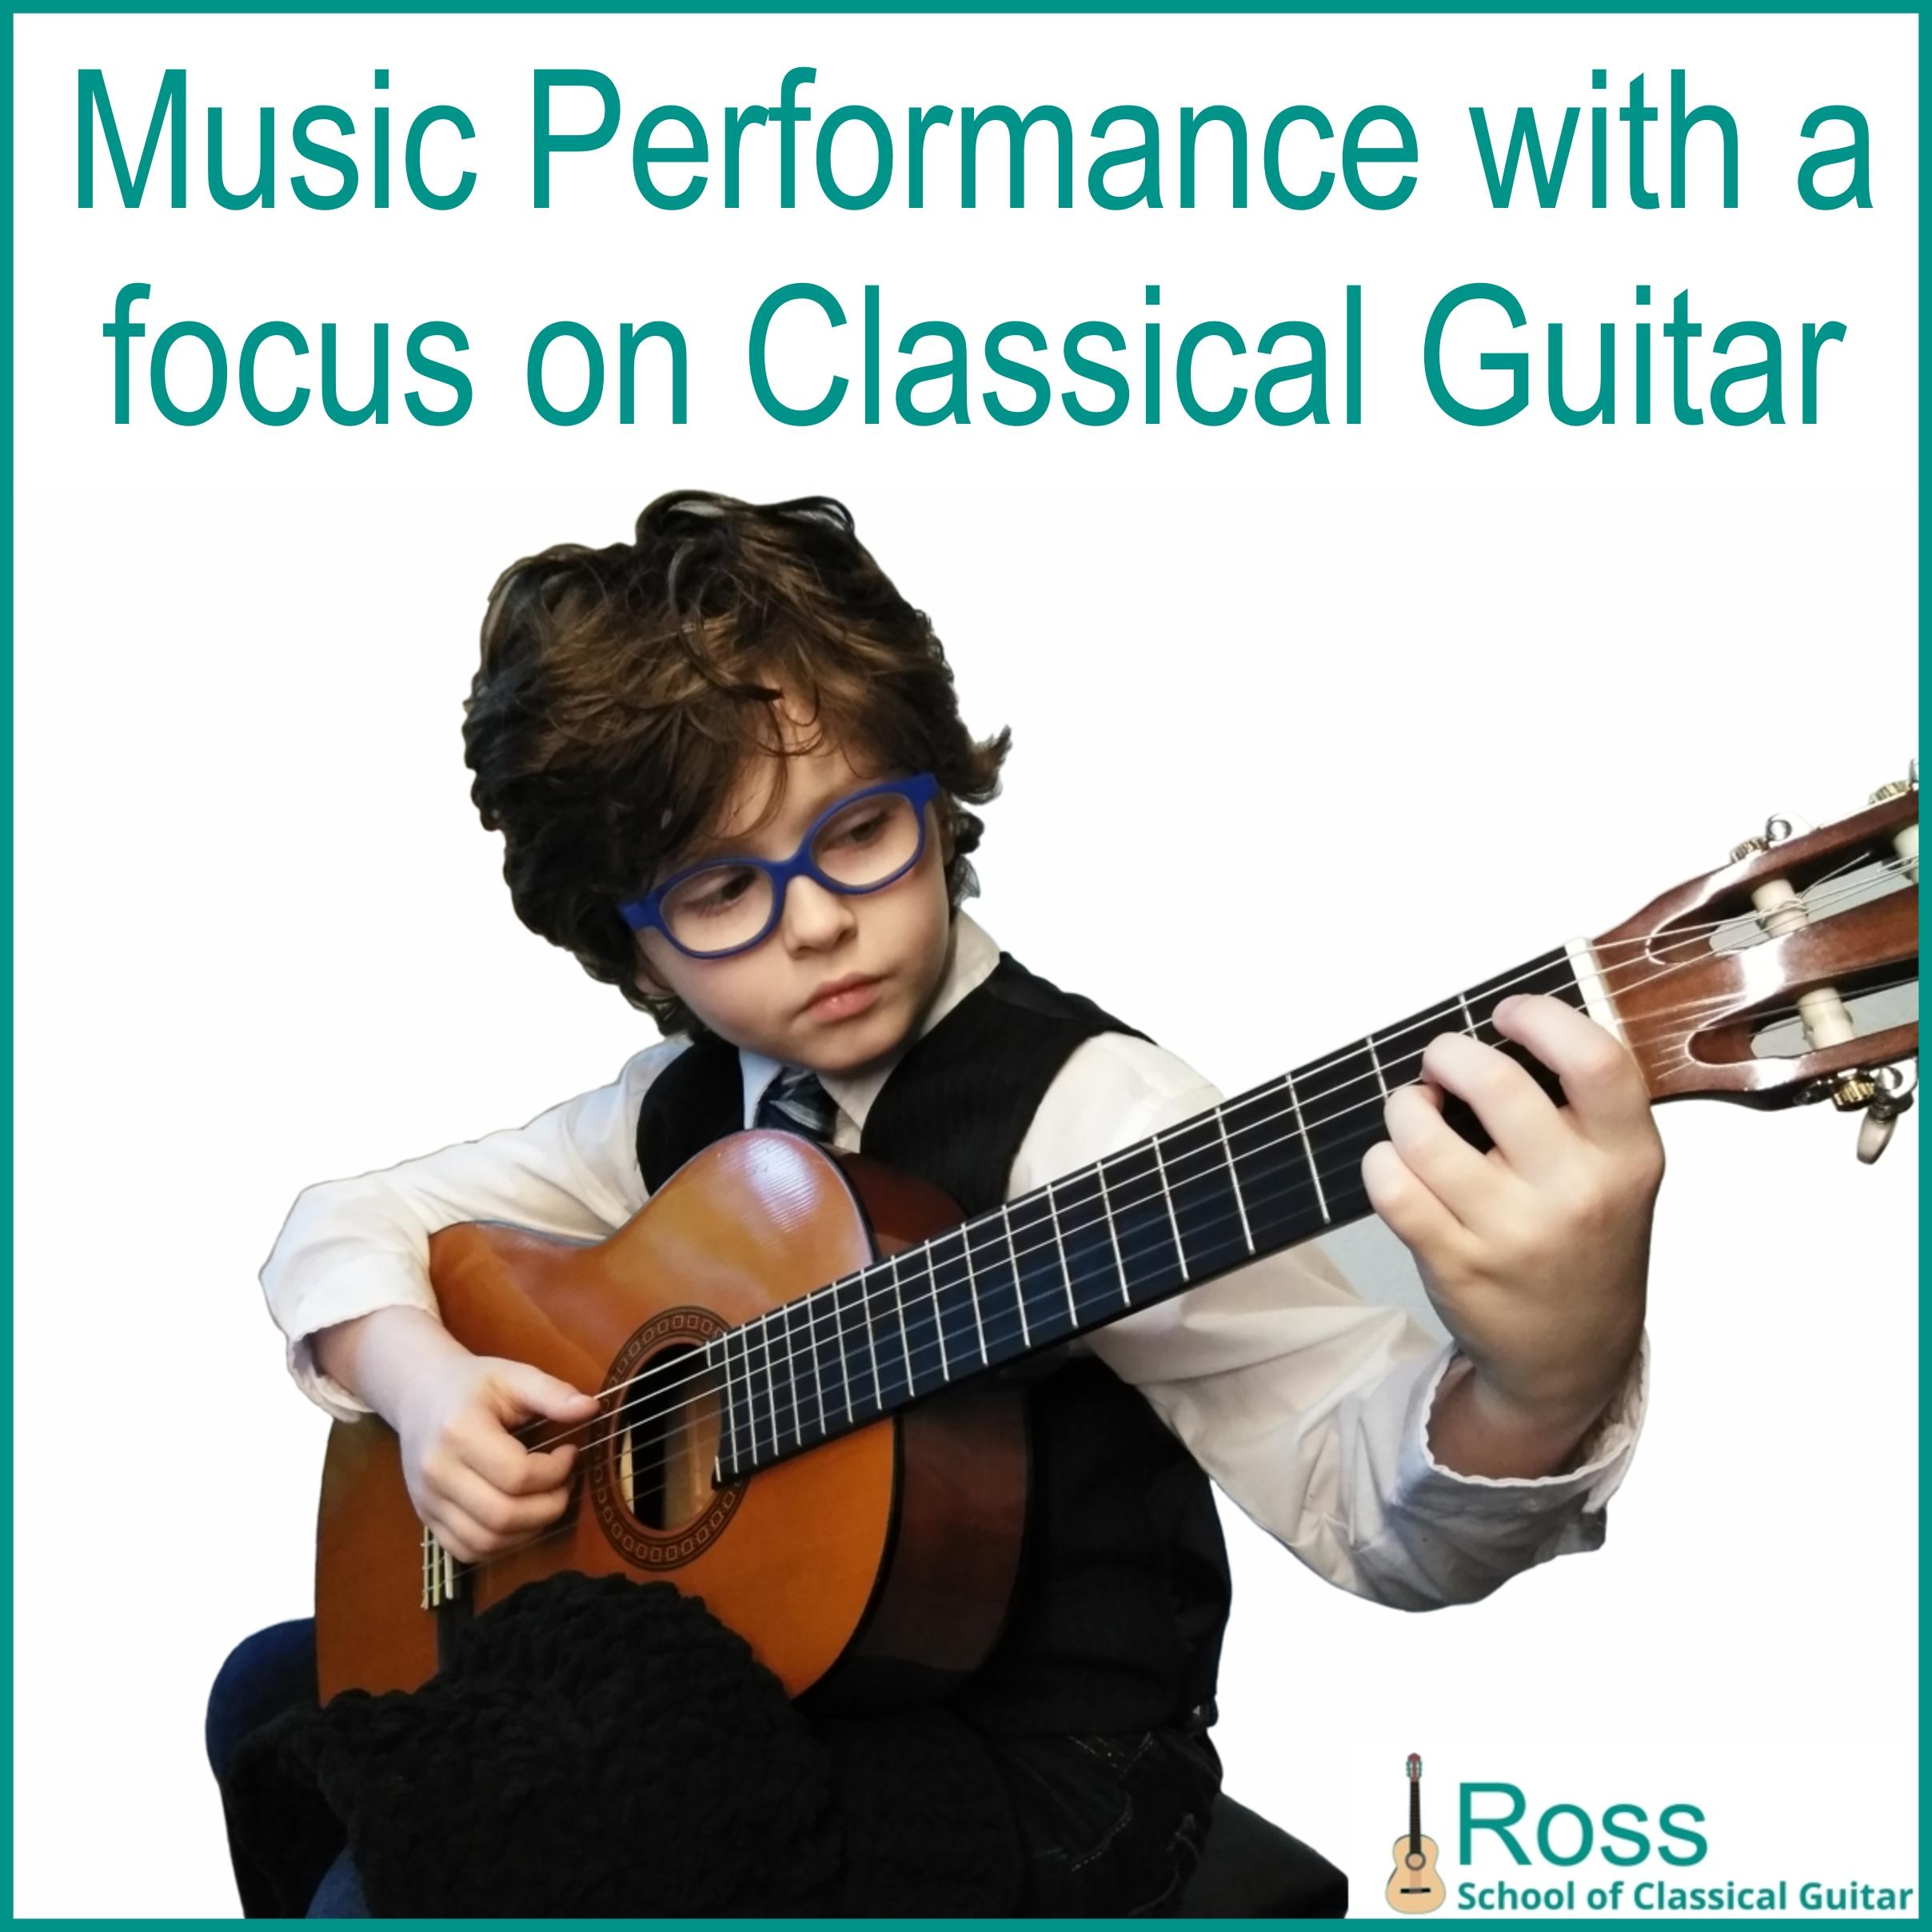 Ross School of Classical Guitar | 23115 NE Canyon Rd, Battle Ground, WA, 98604 | +1 (360) 597-2597